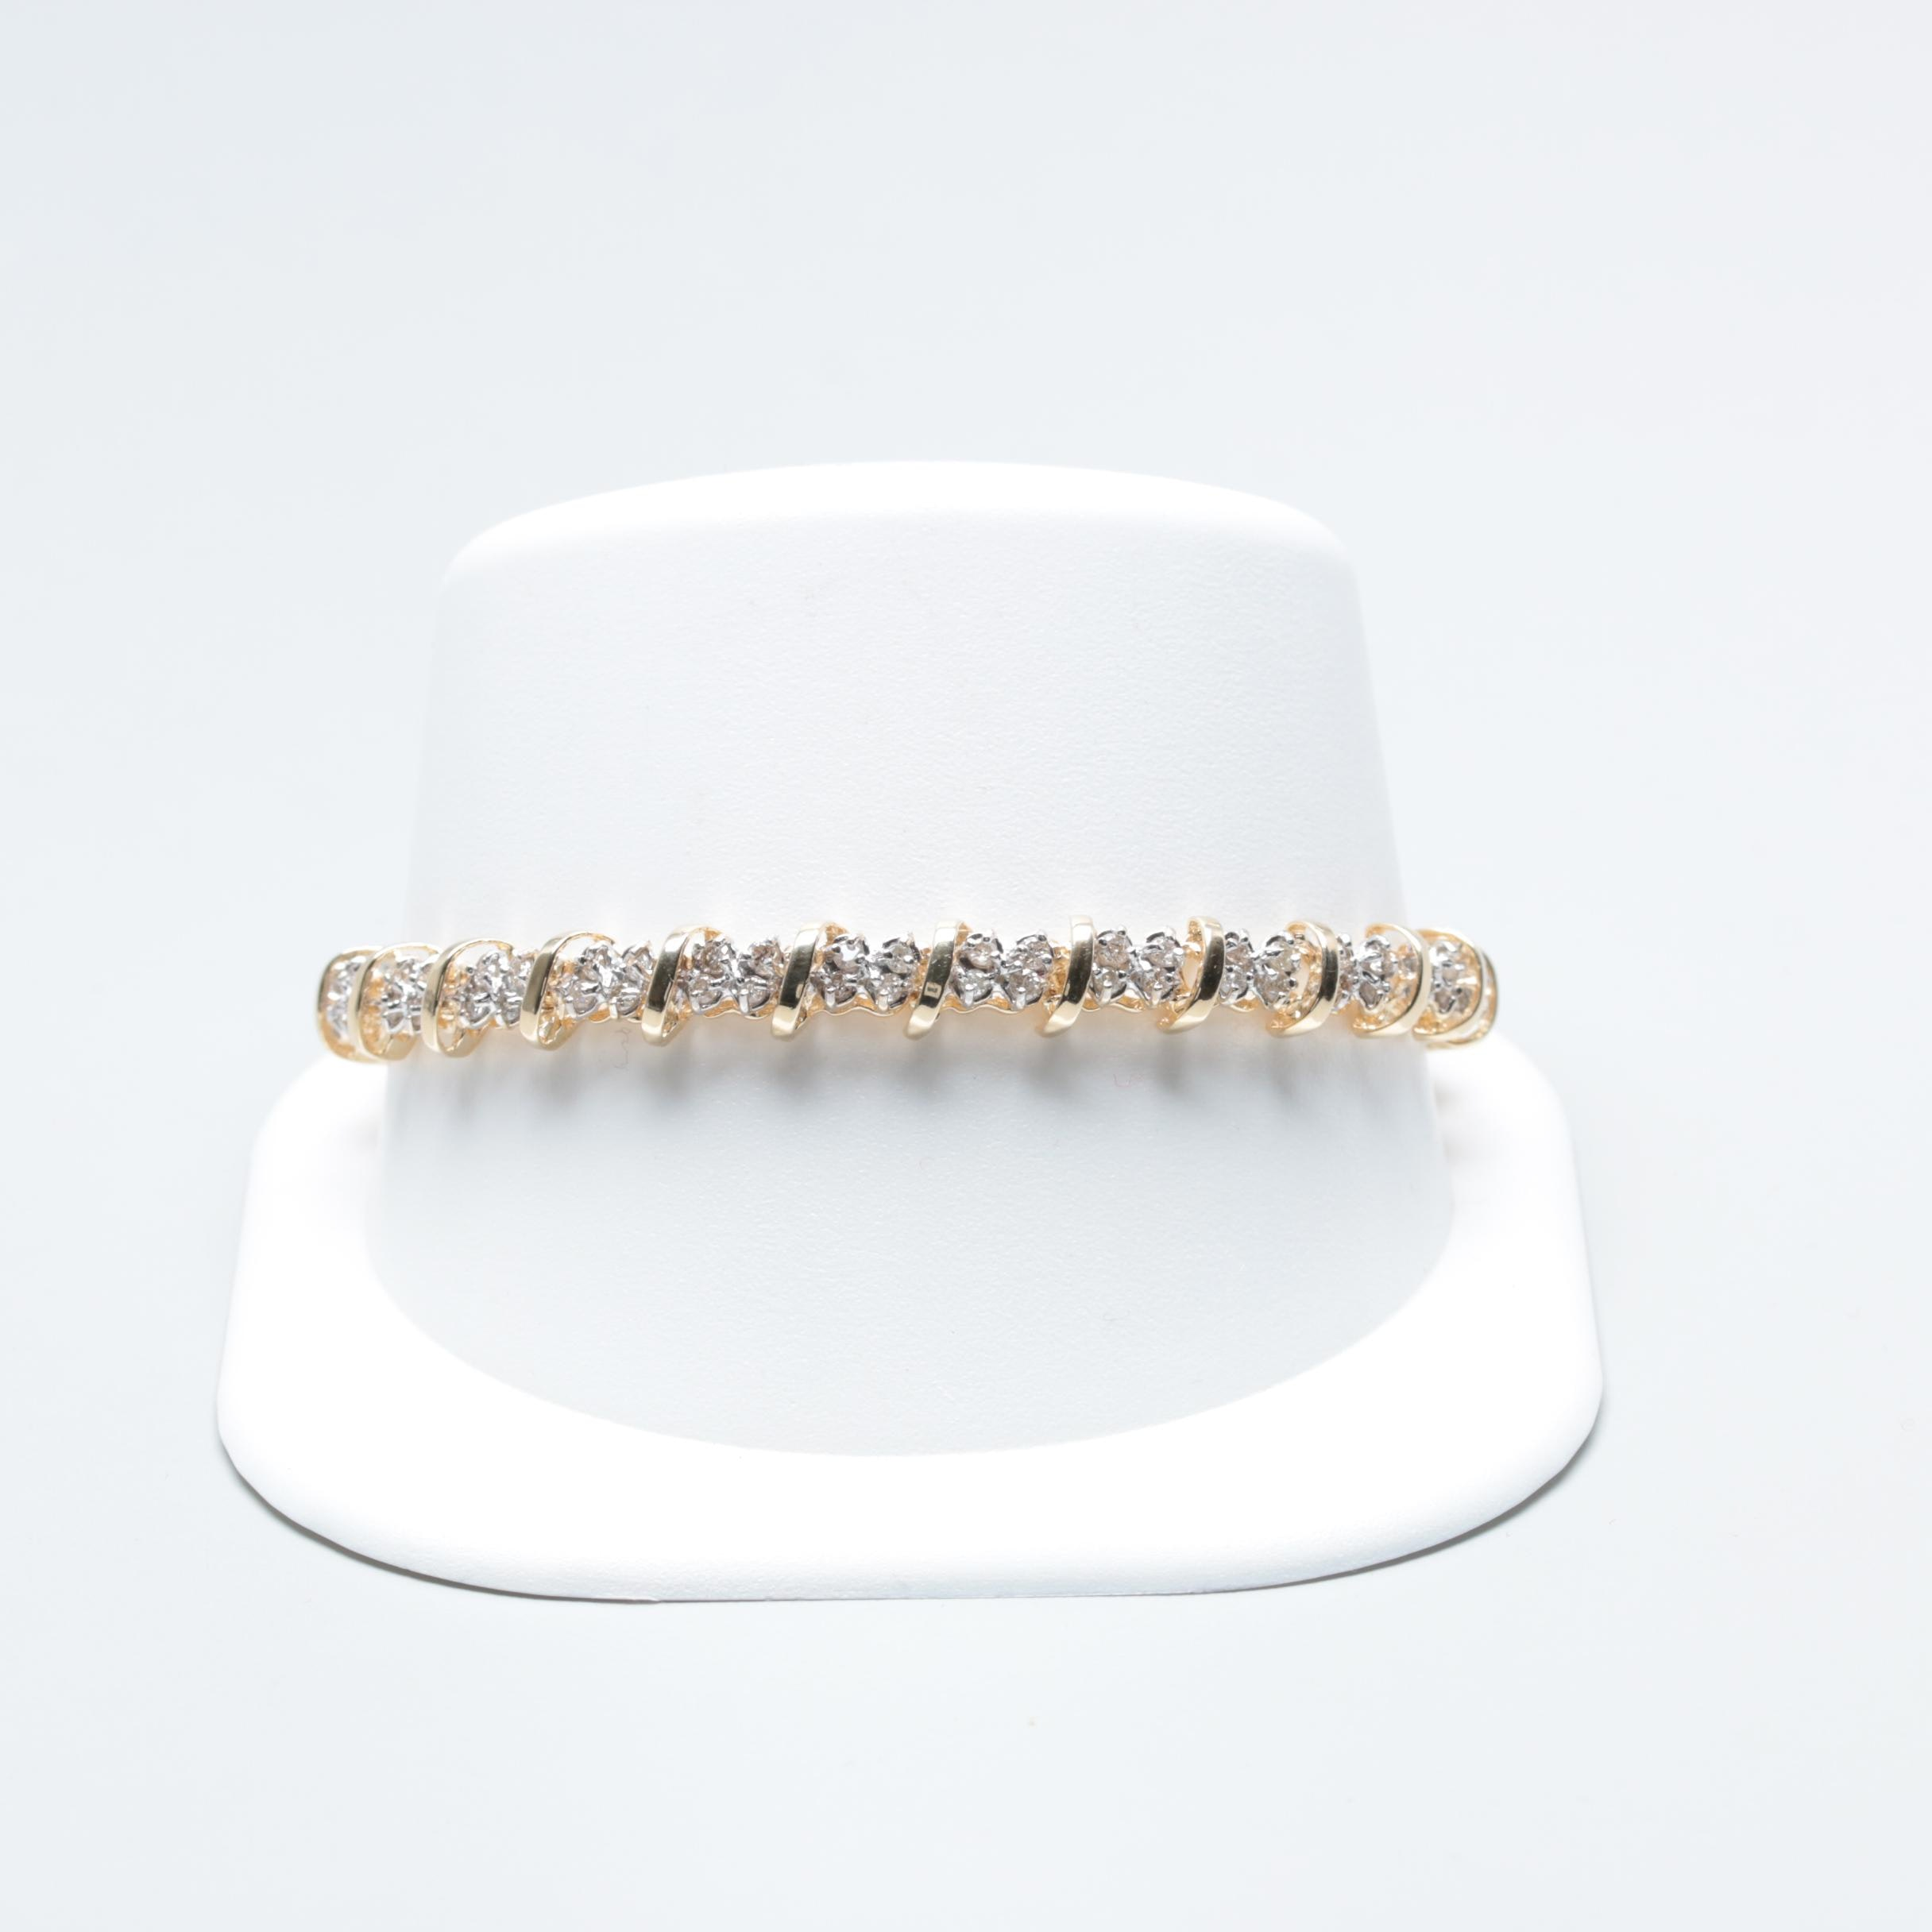 10K Yellow and White Gold 2.50 CTW Diamond Bracelet